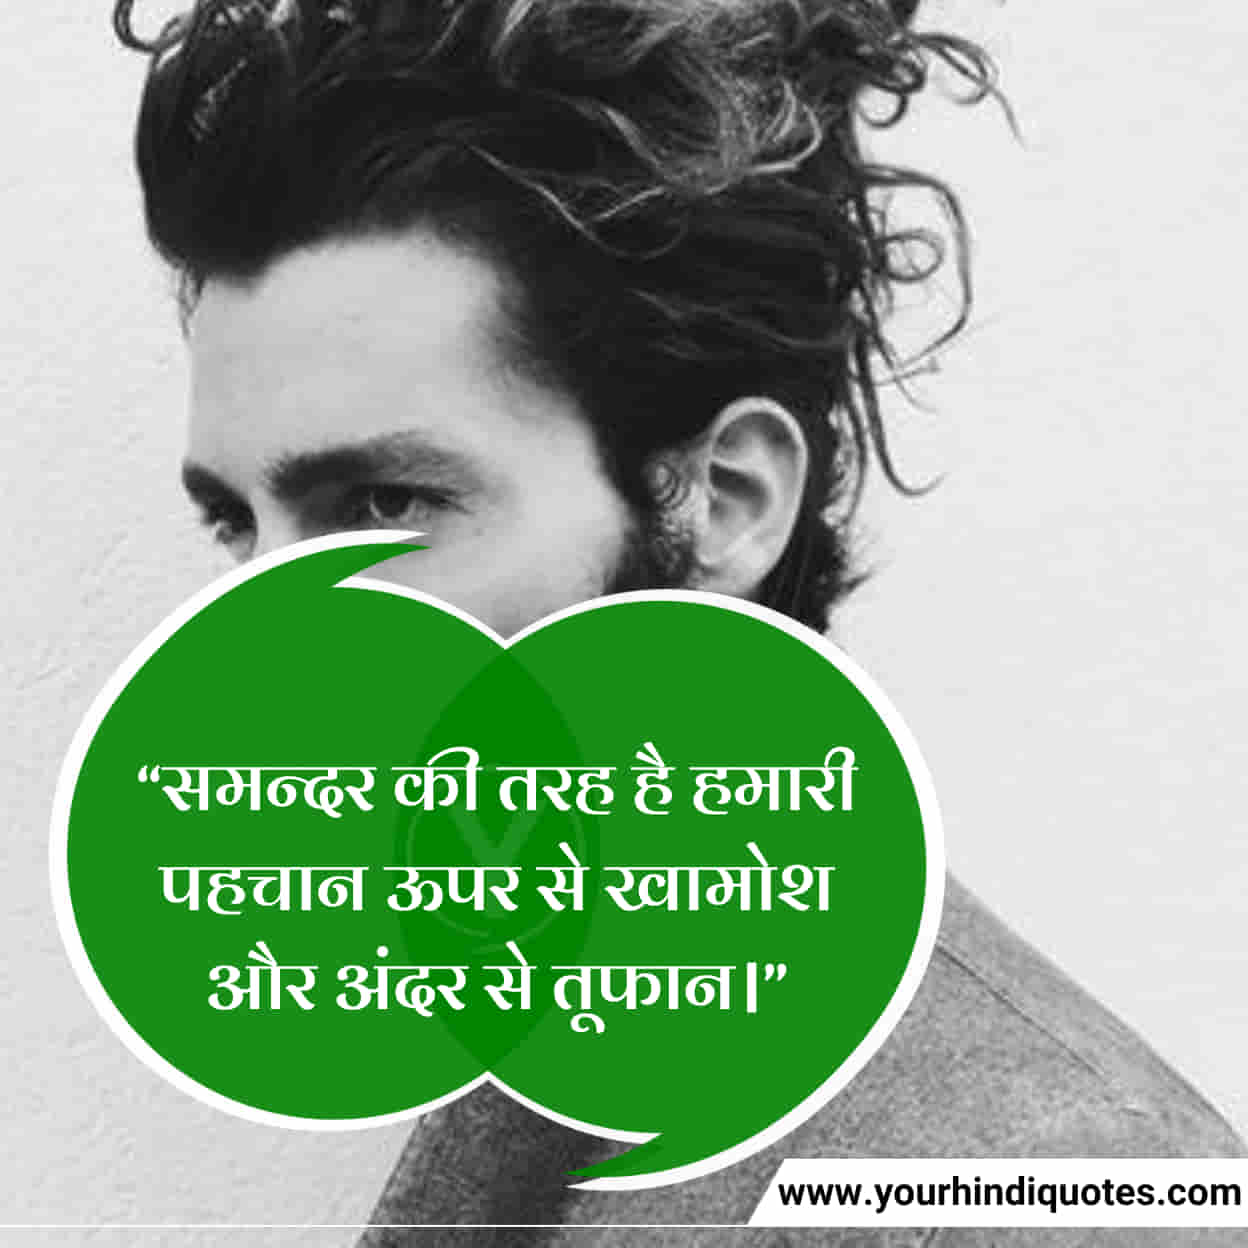 Hindi Love Fb Status In Hindi